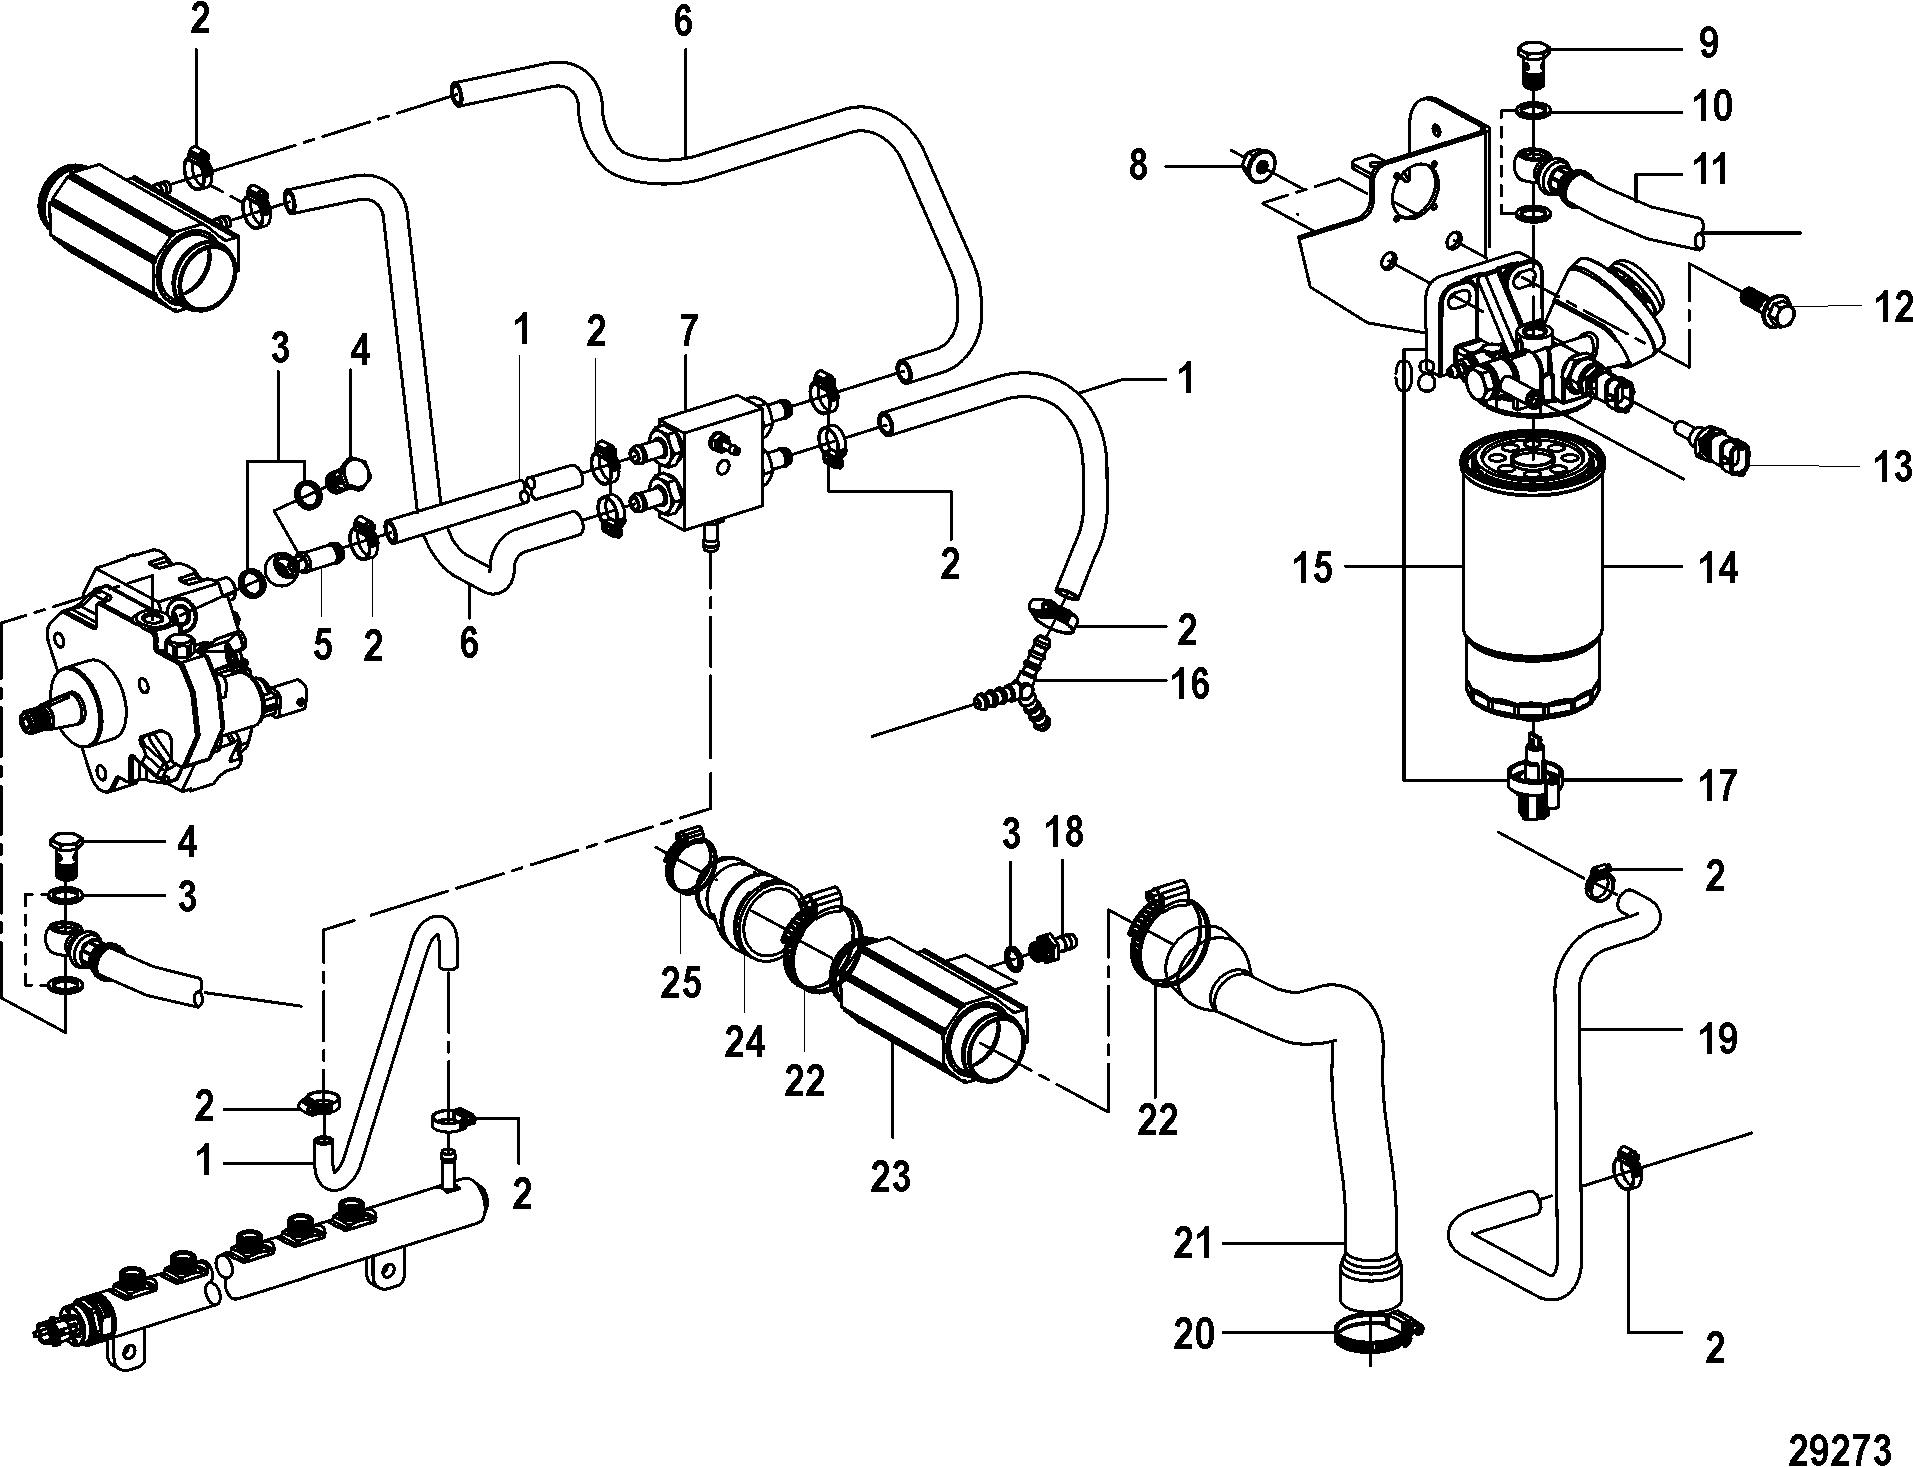 Каталог запчастей MERCRUISER остальные CMD QSD 2 8 EI 170